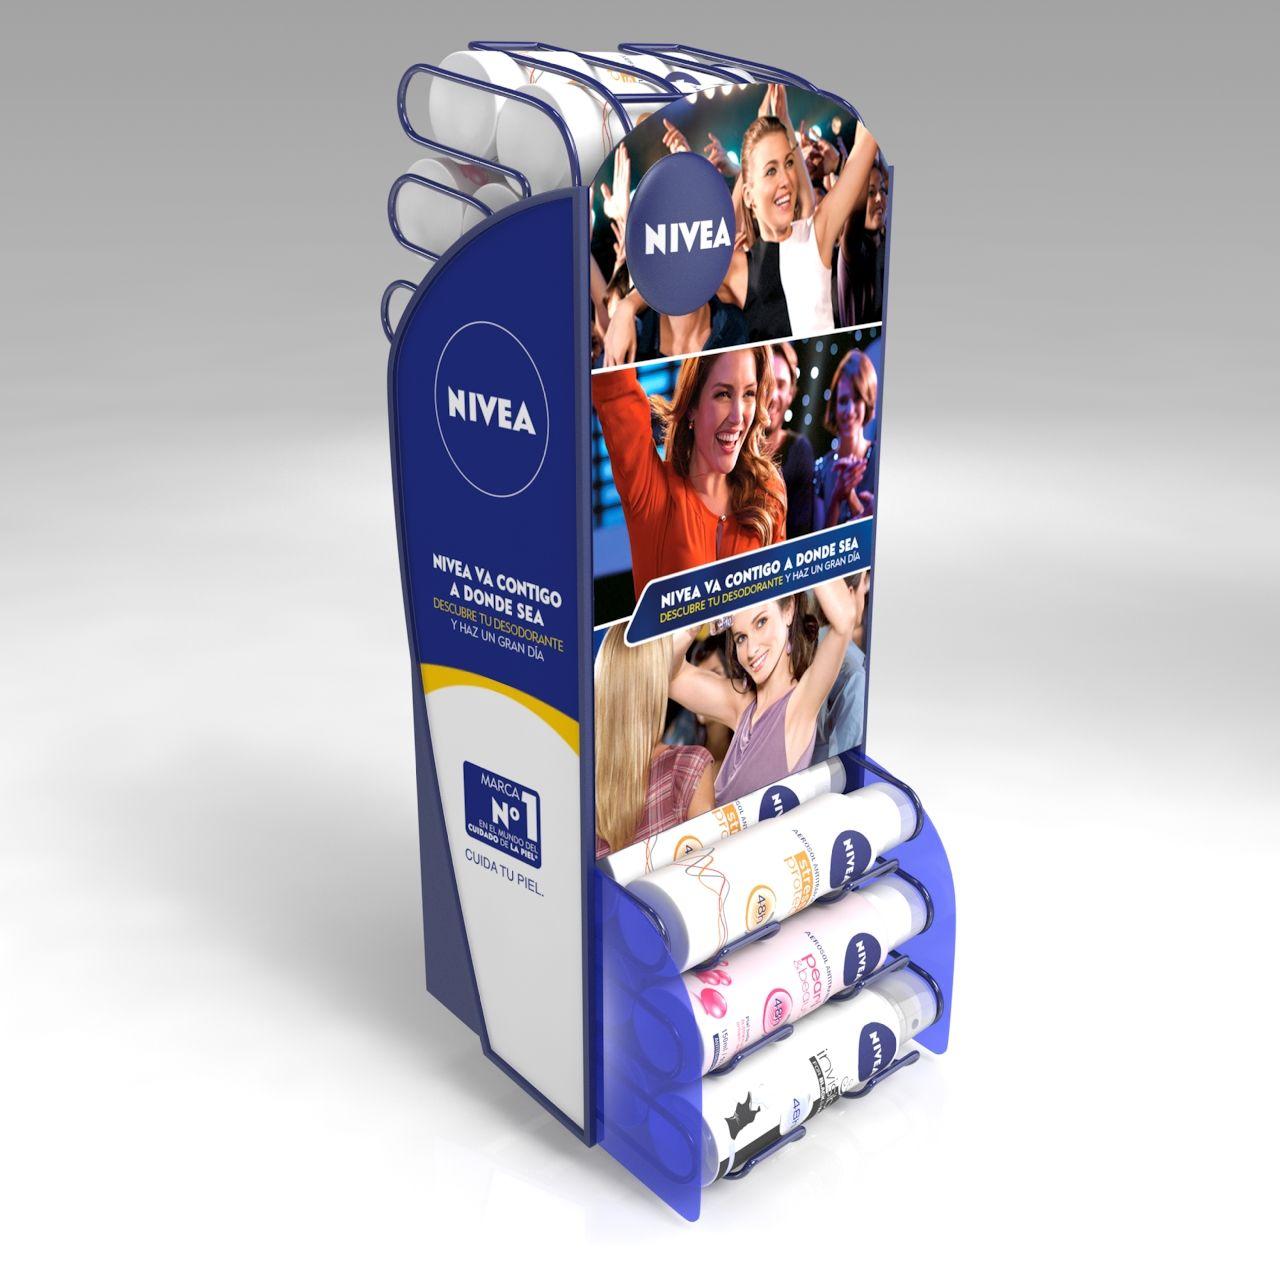 3d Dispenser Woman Detalle Cliente Nivea Beiersdorf  # Muebles Dummy Medellin